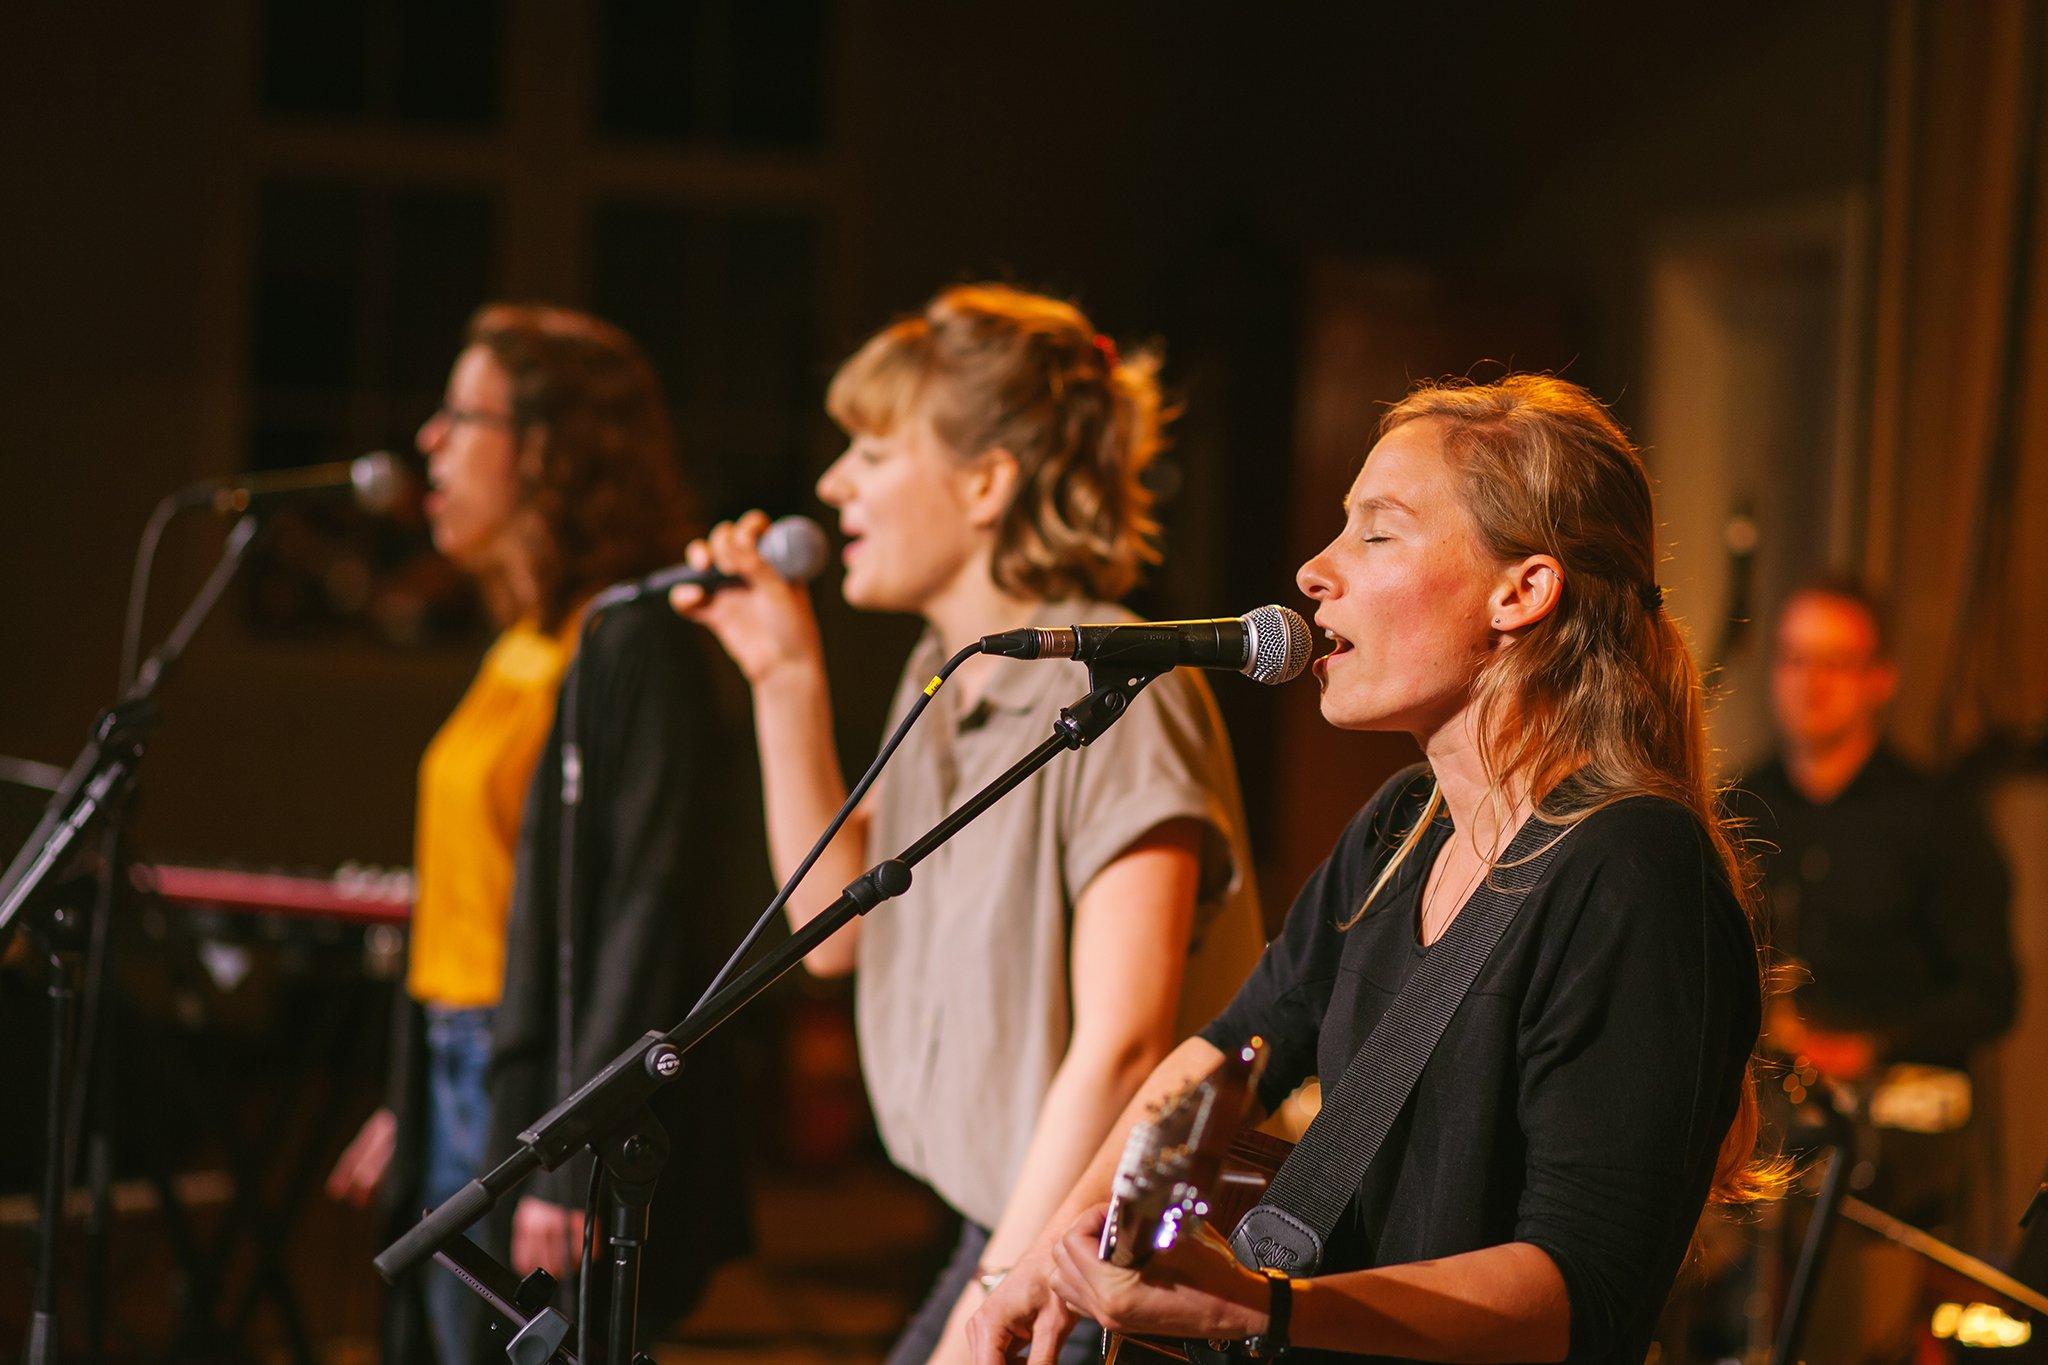 Eben-Ezer-Sessions am 18.10.2019: Marion Dirr mit Band (Foto: Knut Burmeister, ALLTAG)